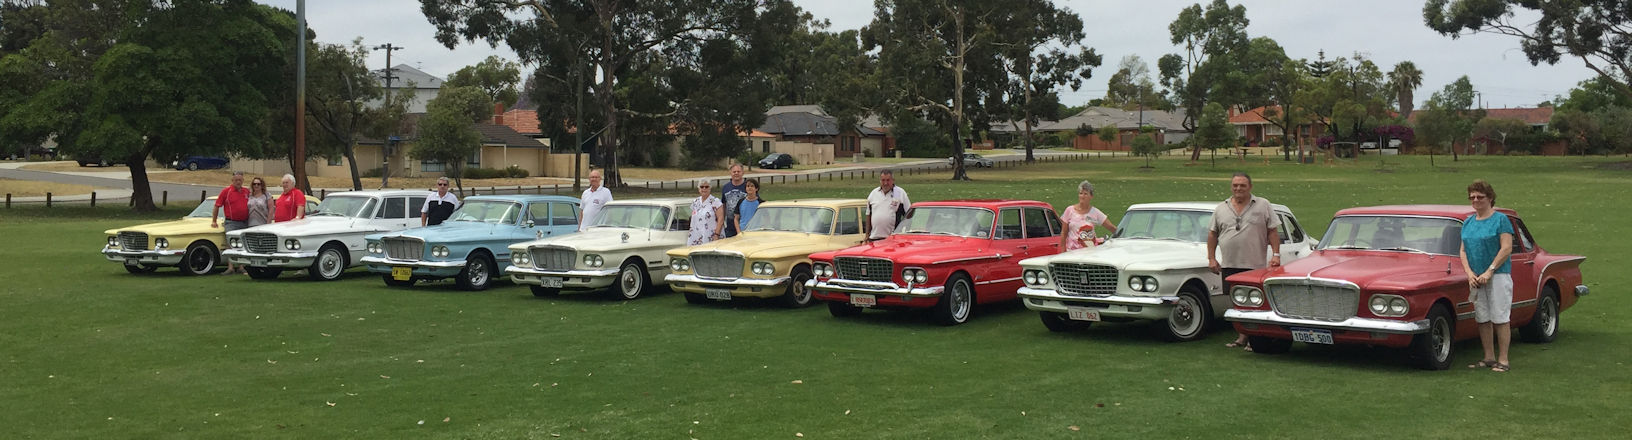 Club Members next their cars